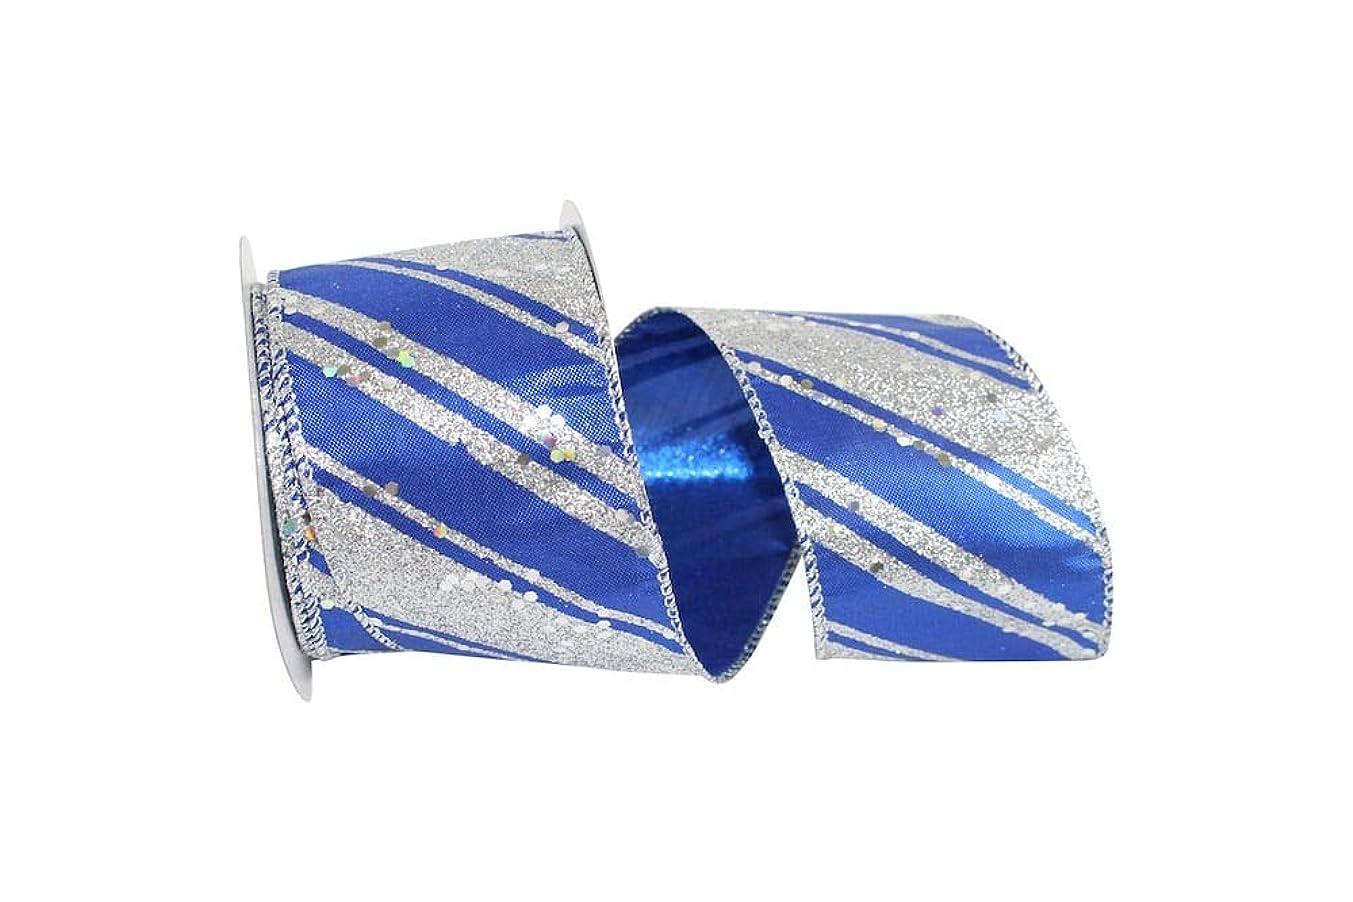 Reliant Ribbon 93190W-989-40F Royal Glitter Stripes Lame Wired Edge Ribbon, 2-1/2 Inch X 10 Yards, Silver